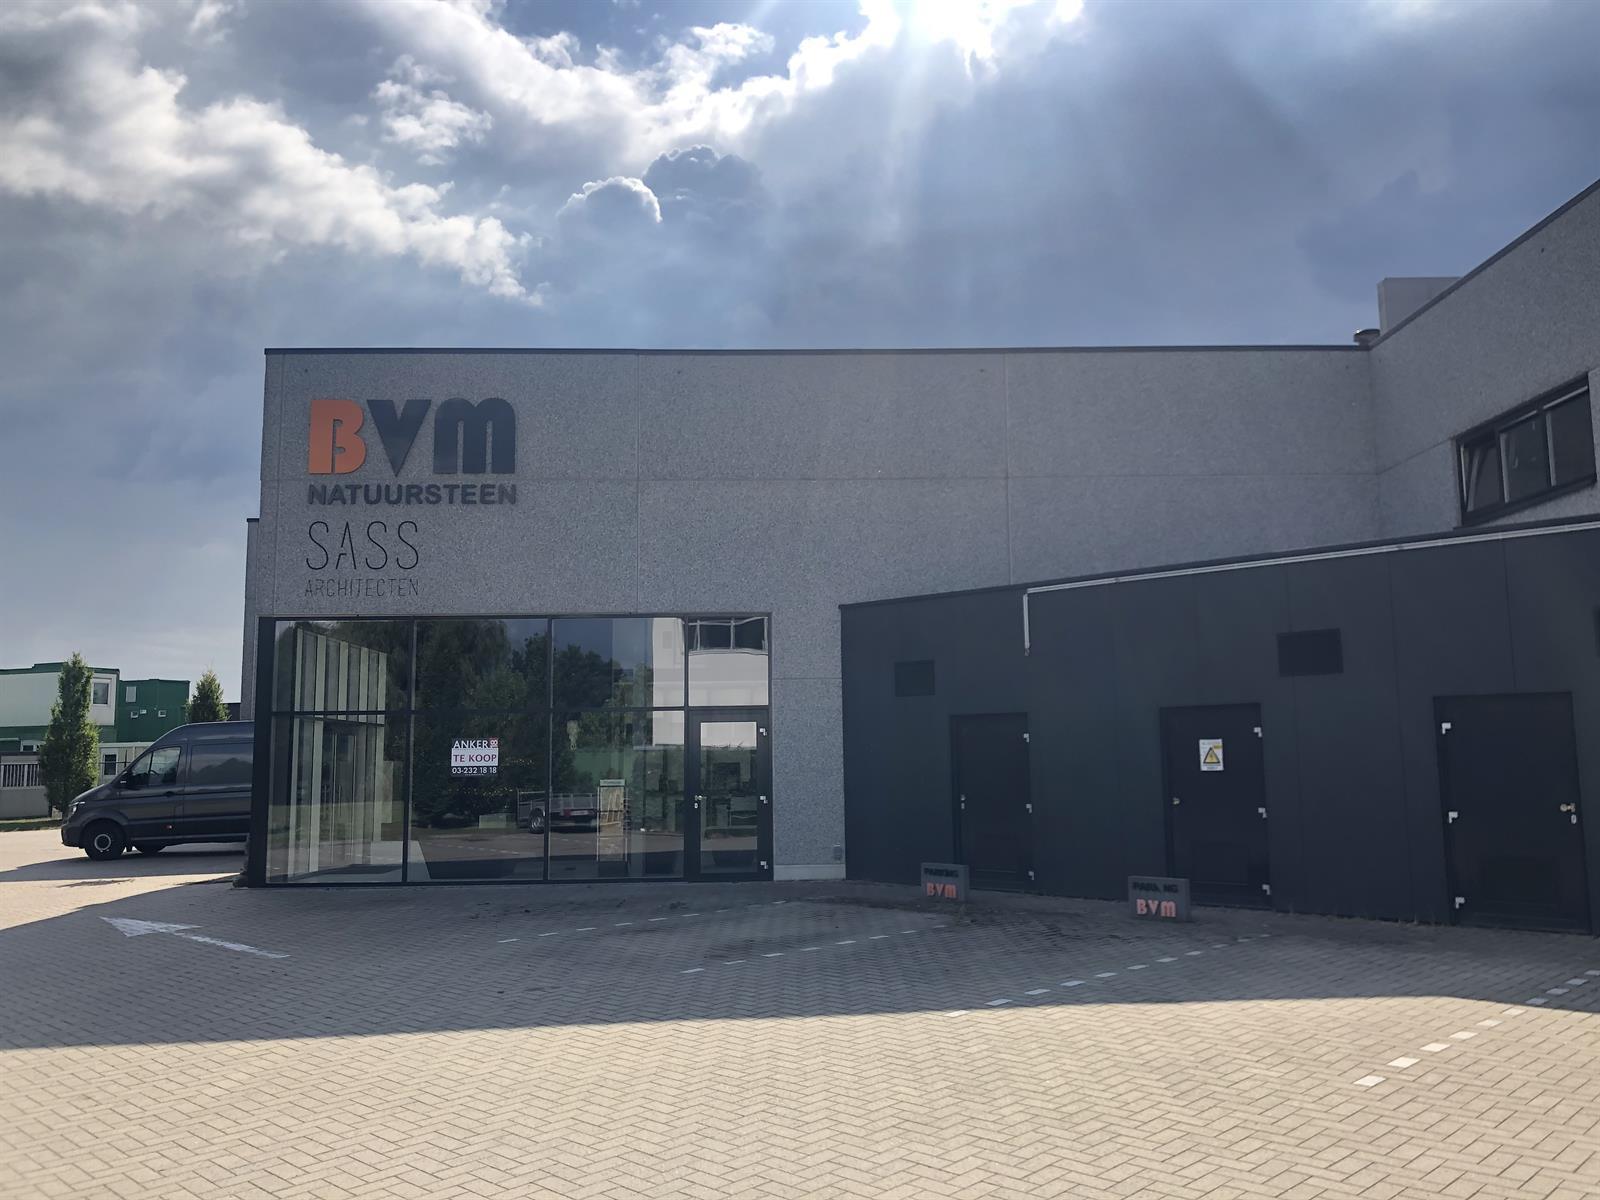 KMO-unit te koop I124 - KMO-Unit - Schoenstraat 11 K, 9140 Temse, België 19